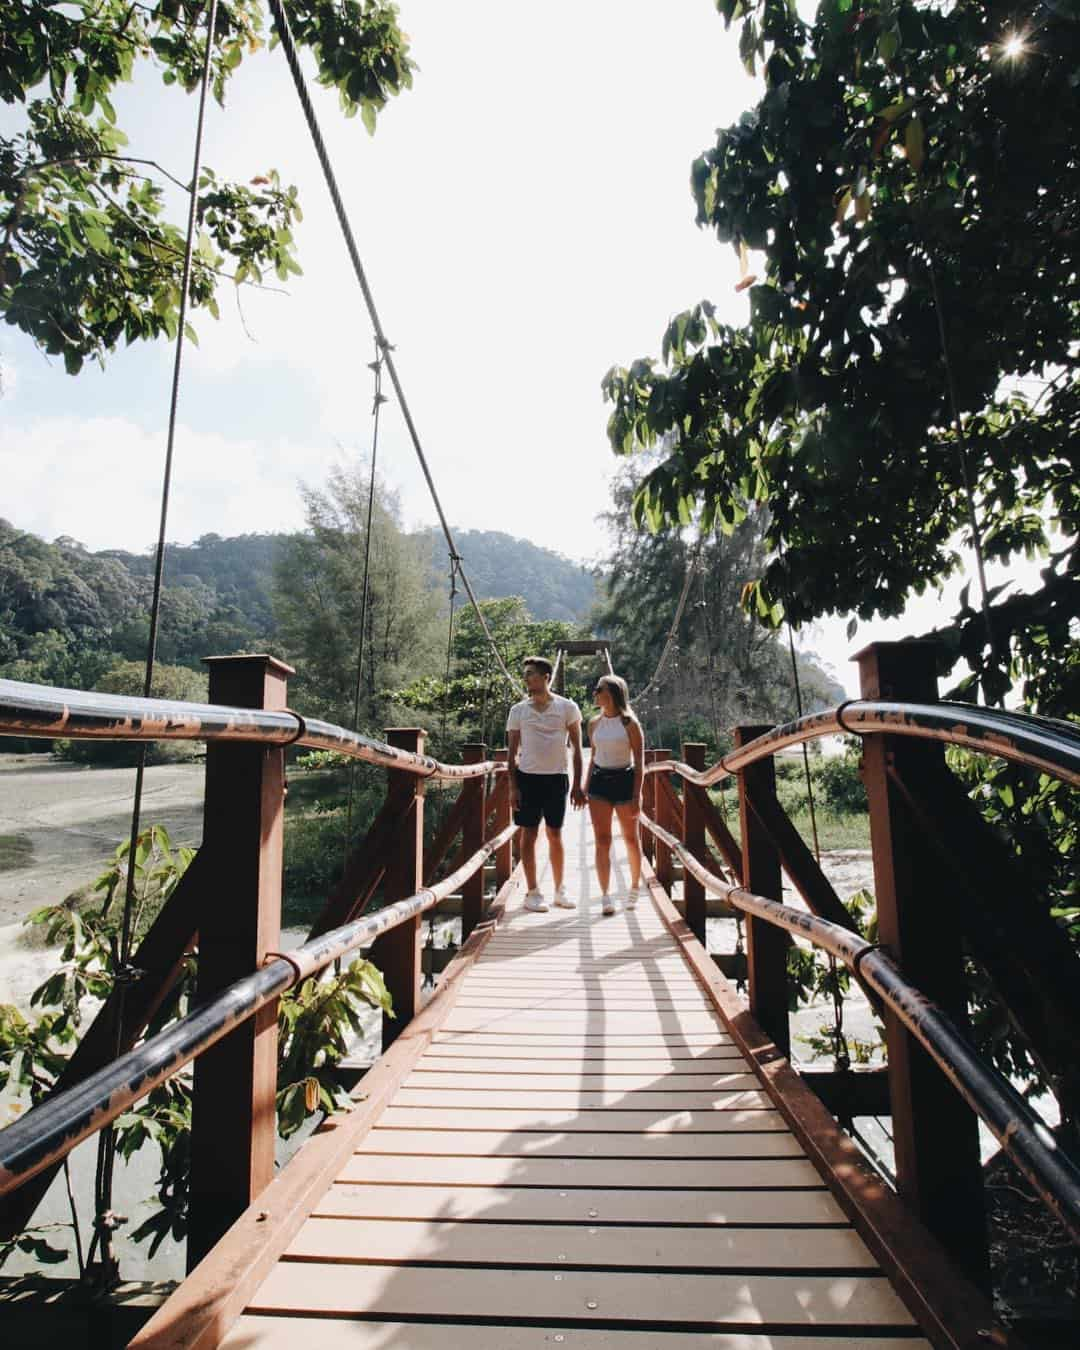 Tempat Wisata Terbaik Malaysia yang Wajib Dikunjungi